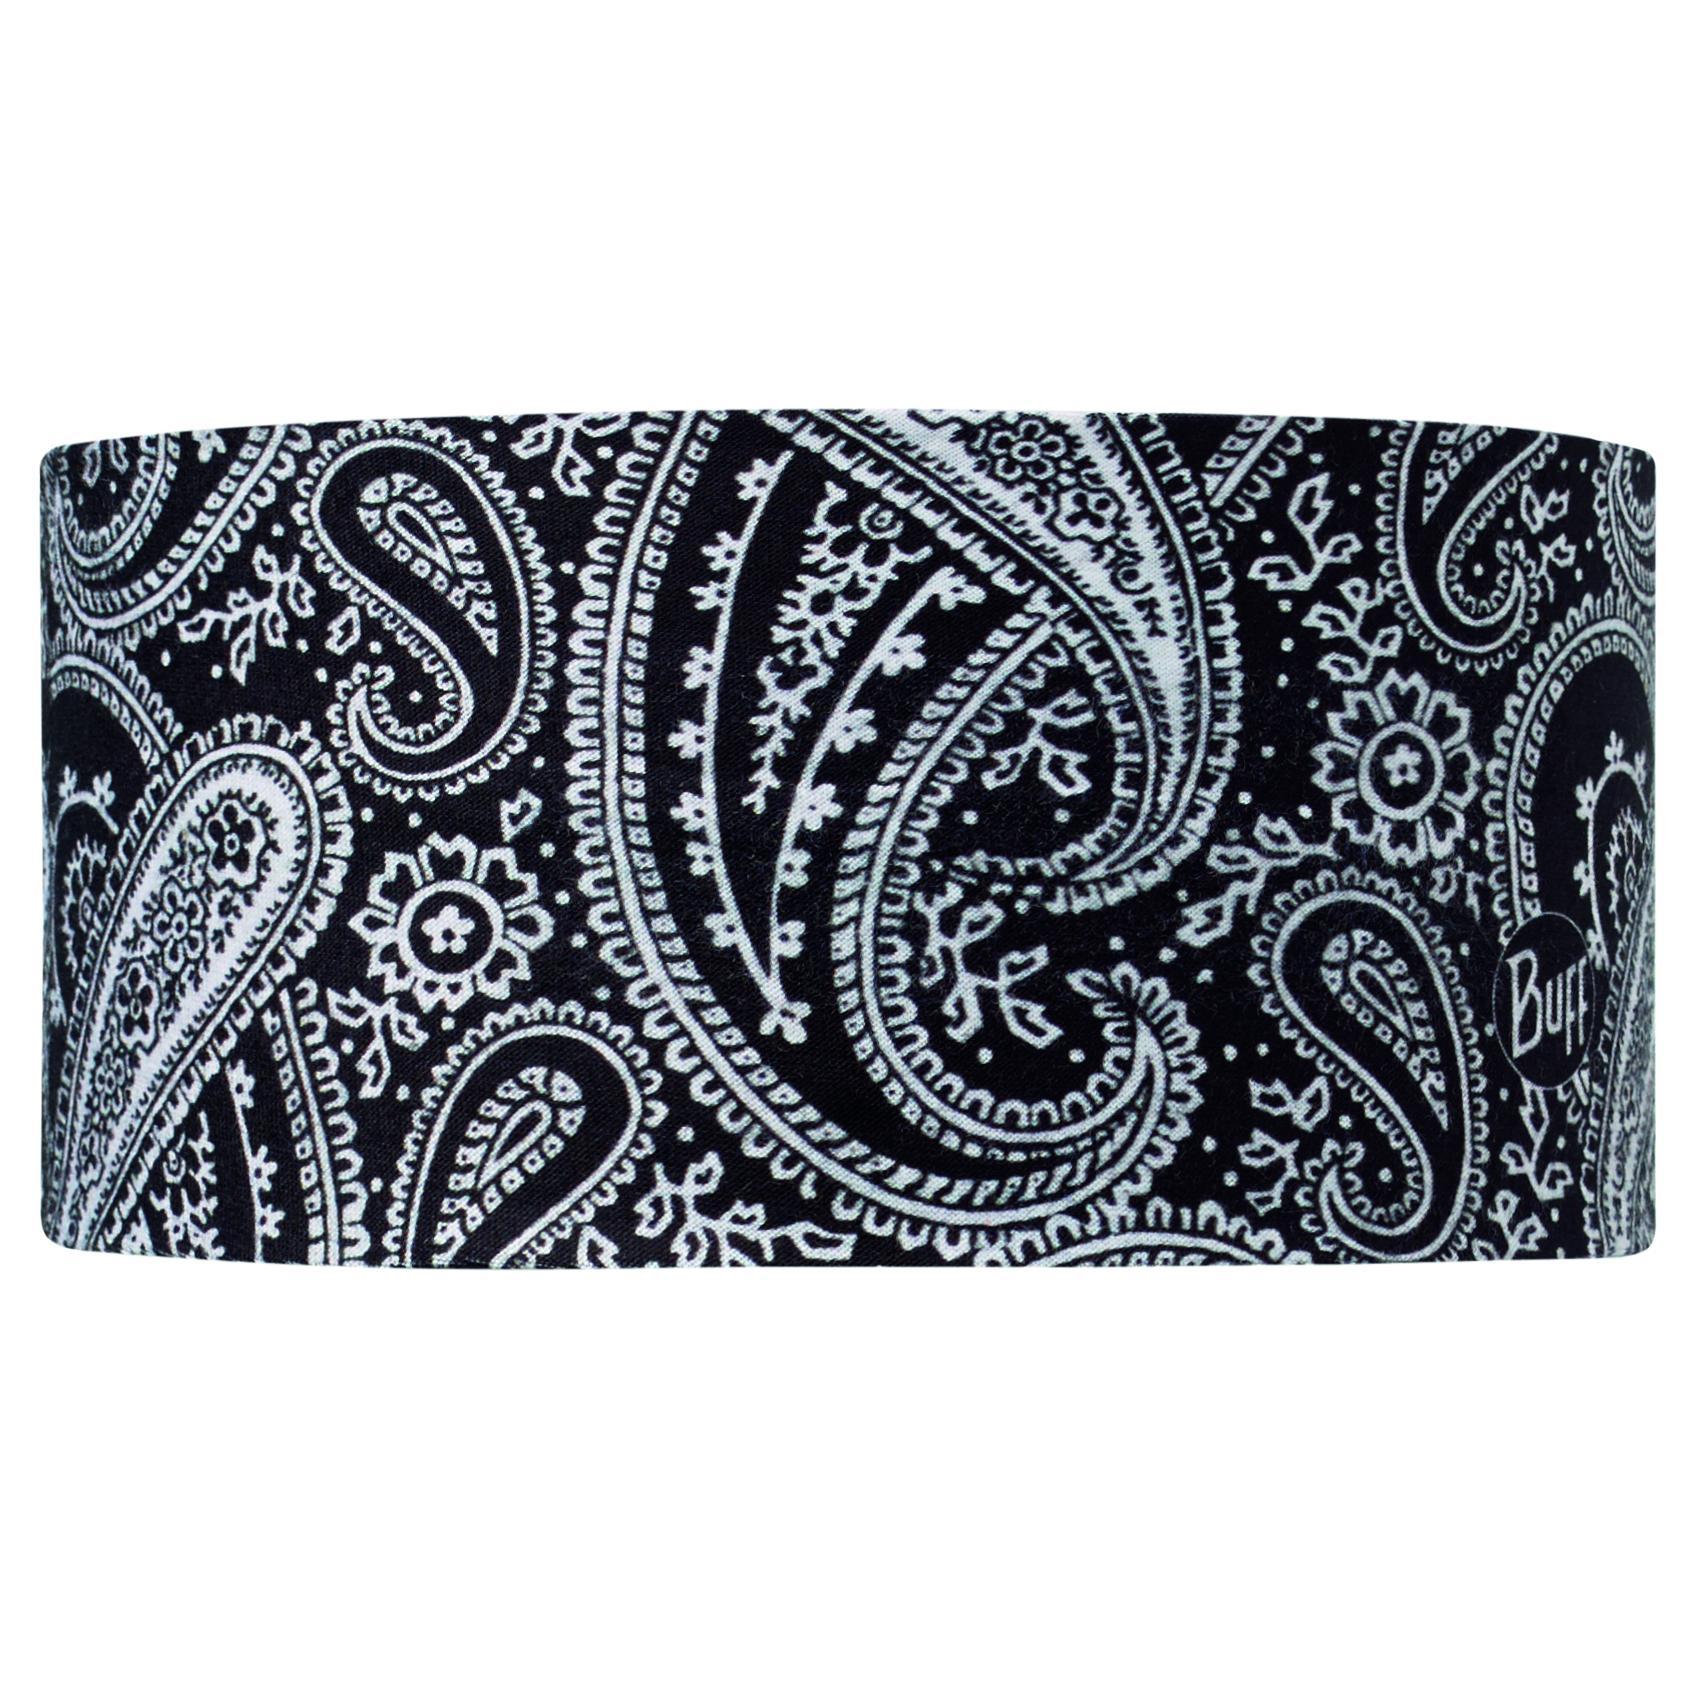 Купить Повязка BUFF HEADBAND CAIL BLACK Банданы и шарфы Buff ® 1149569